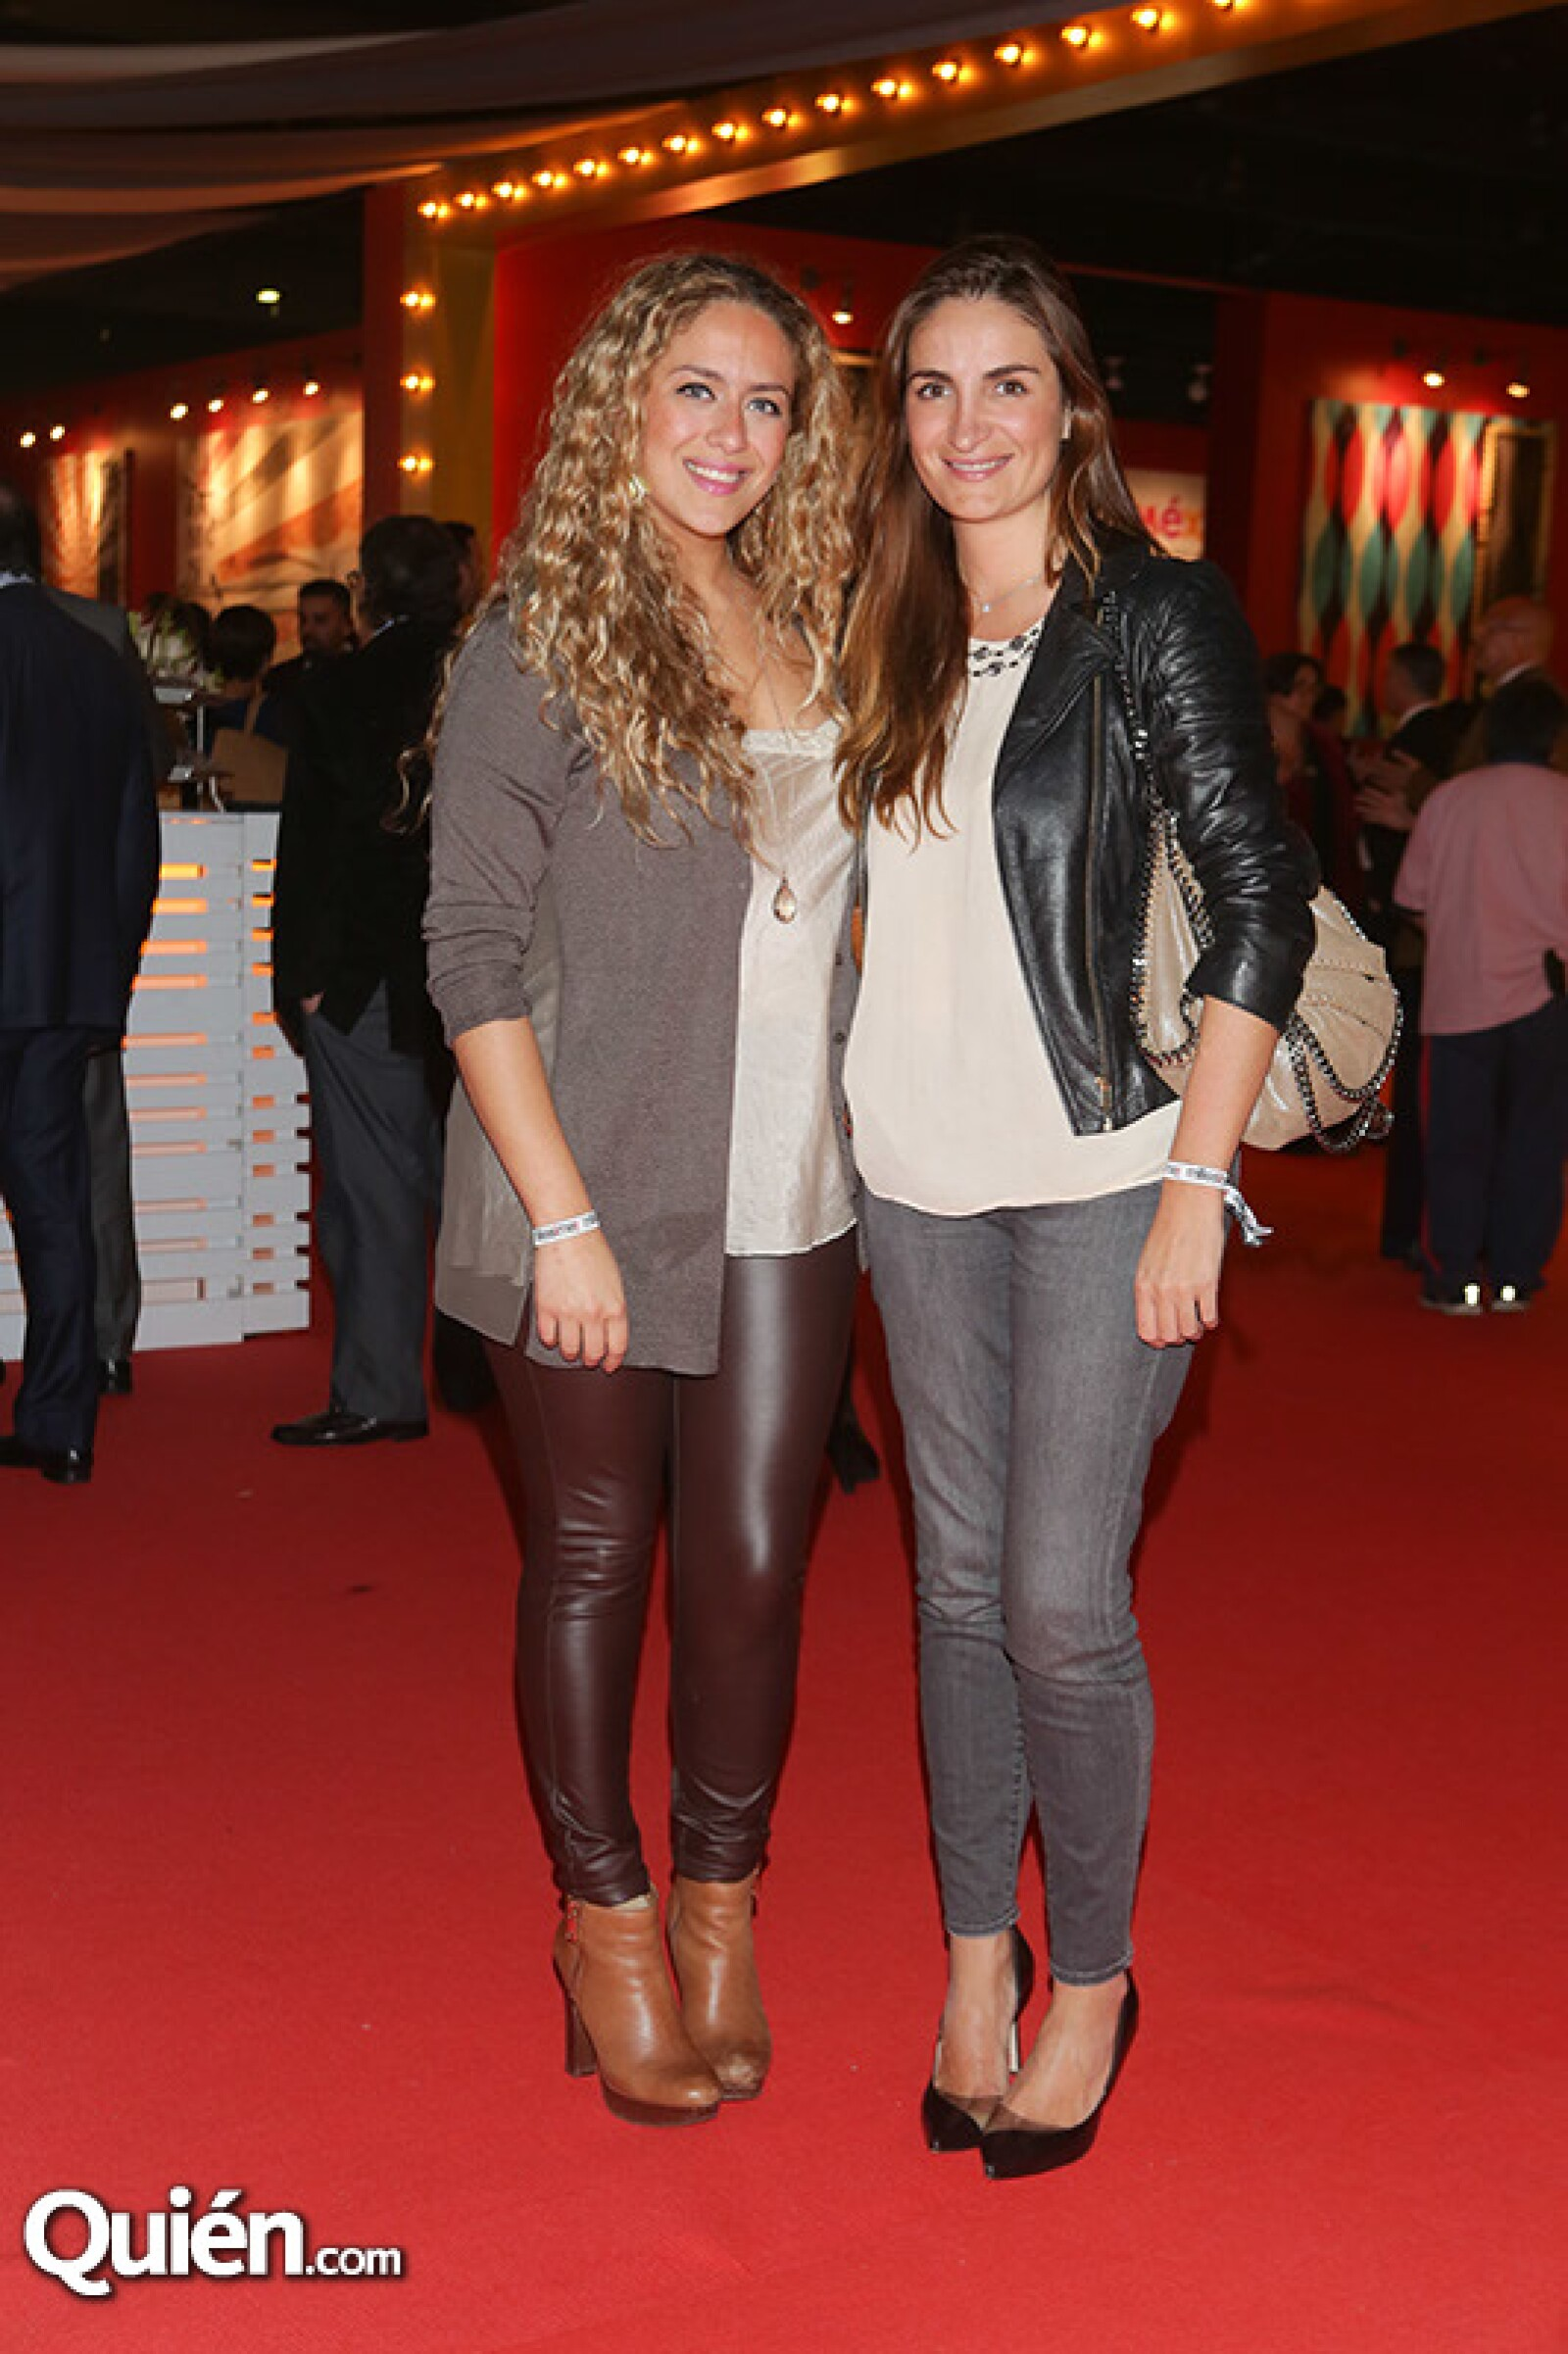 Linda Cherem y Karla Cortina